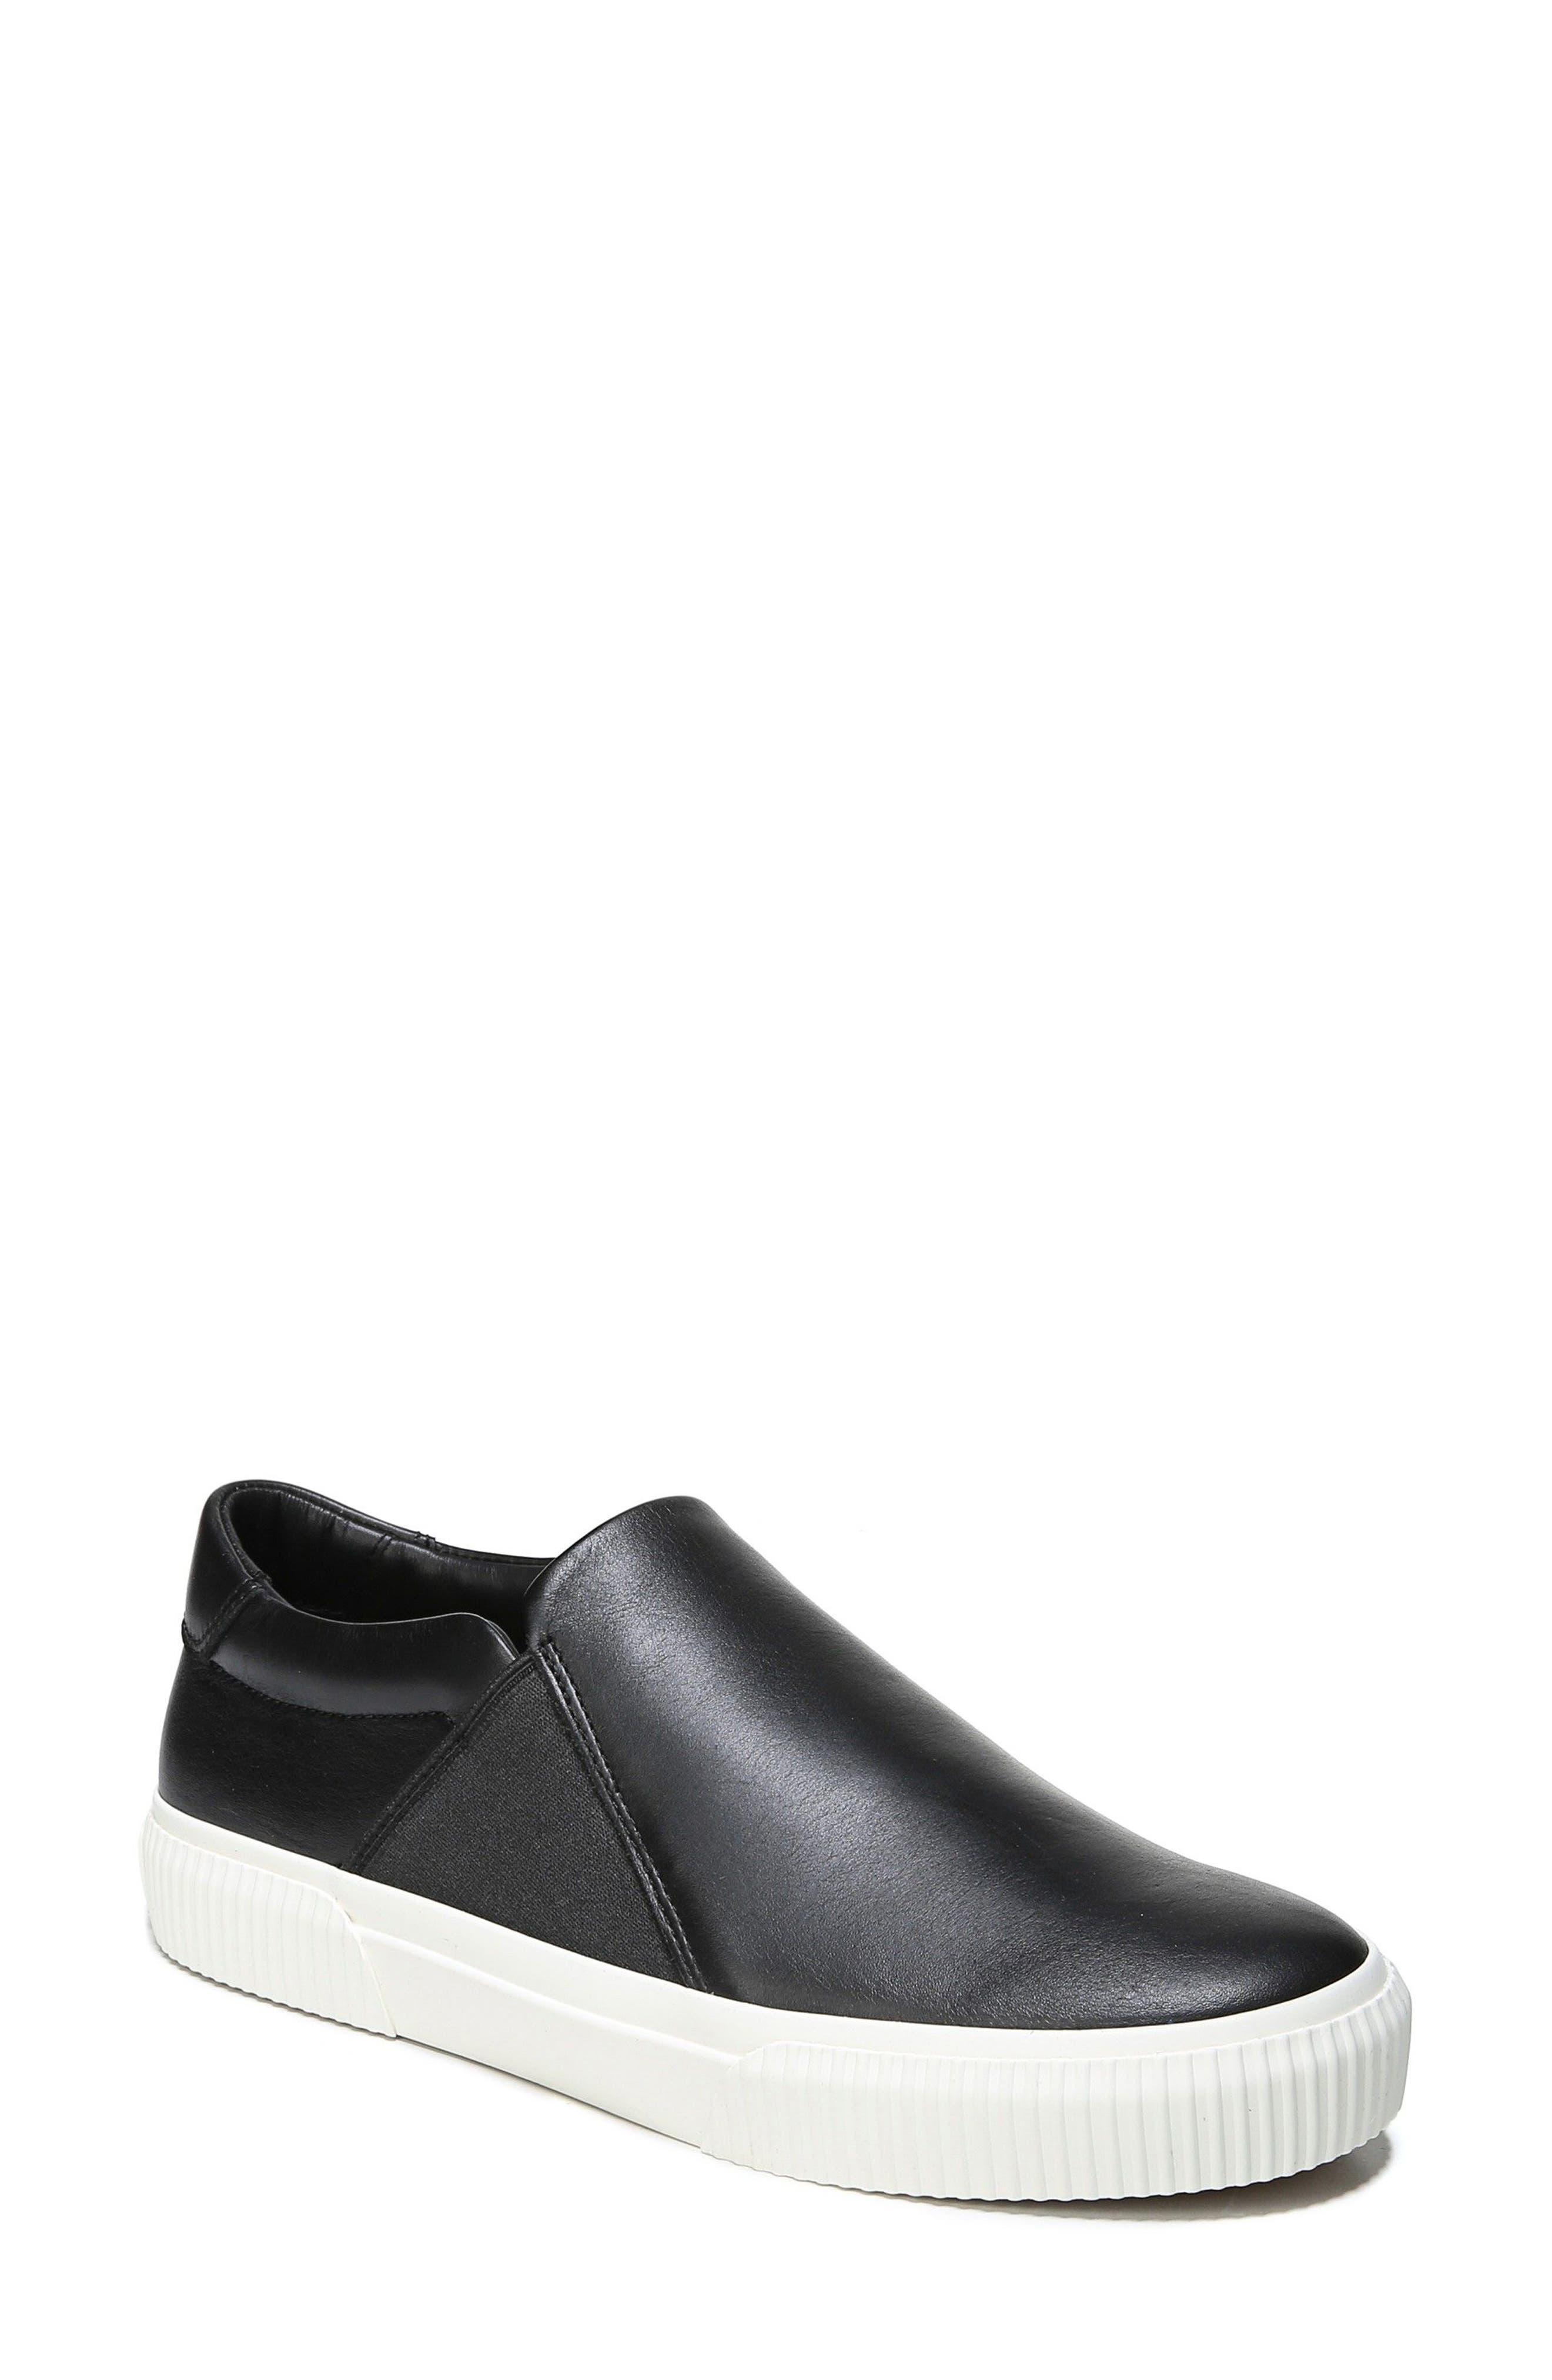 Knox Slip-On Sneaker,                         Main,                         color,